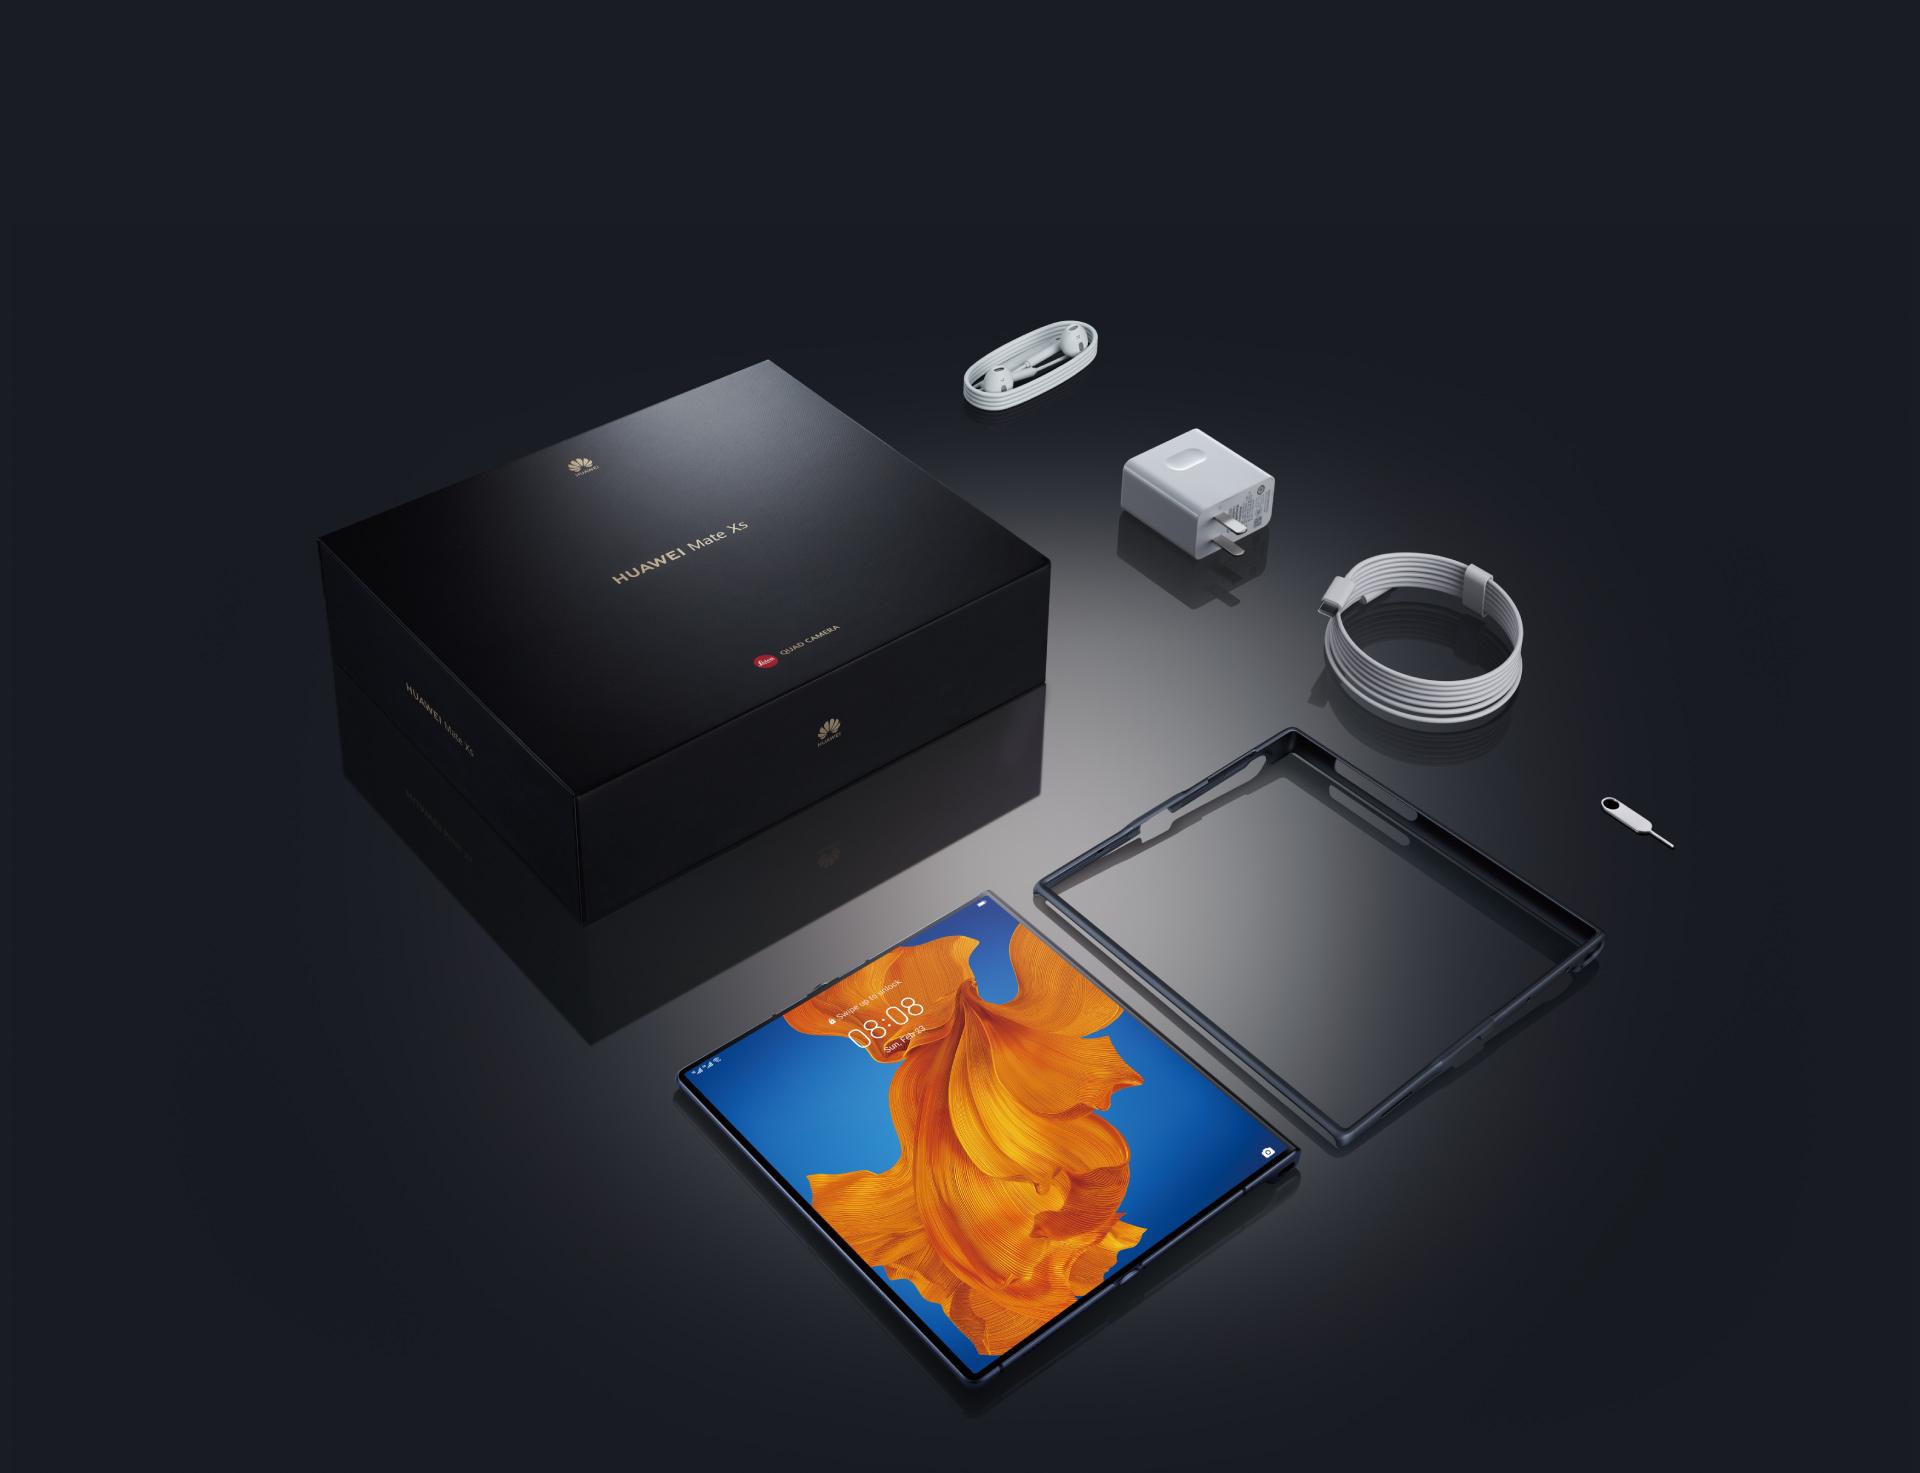 Huawei MateXs